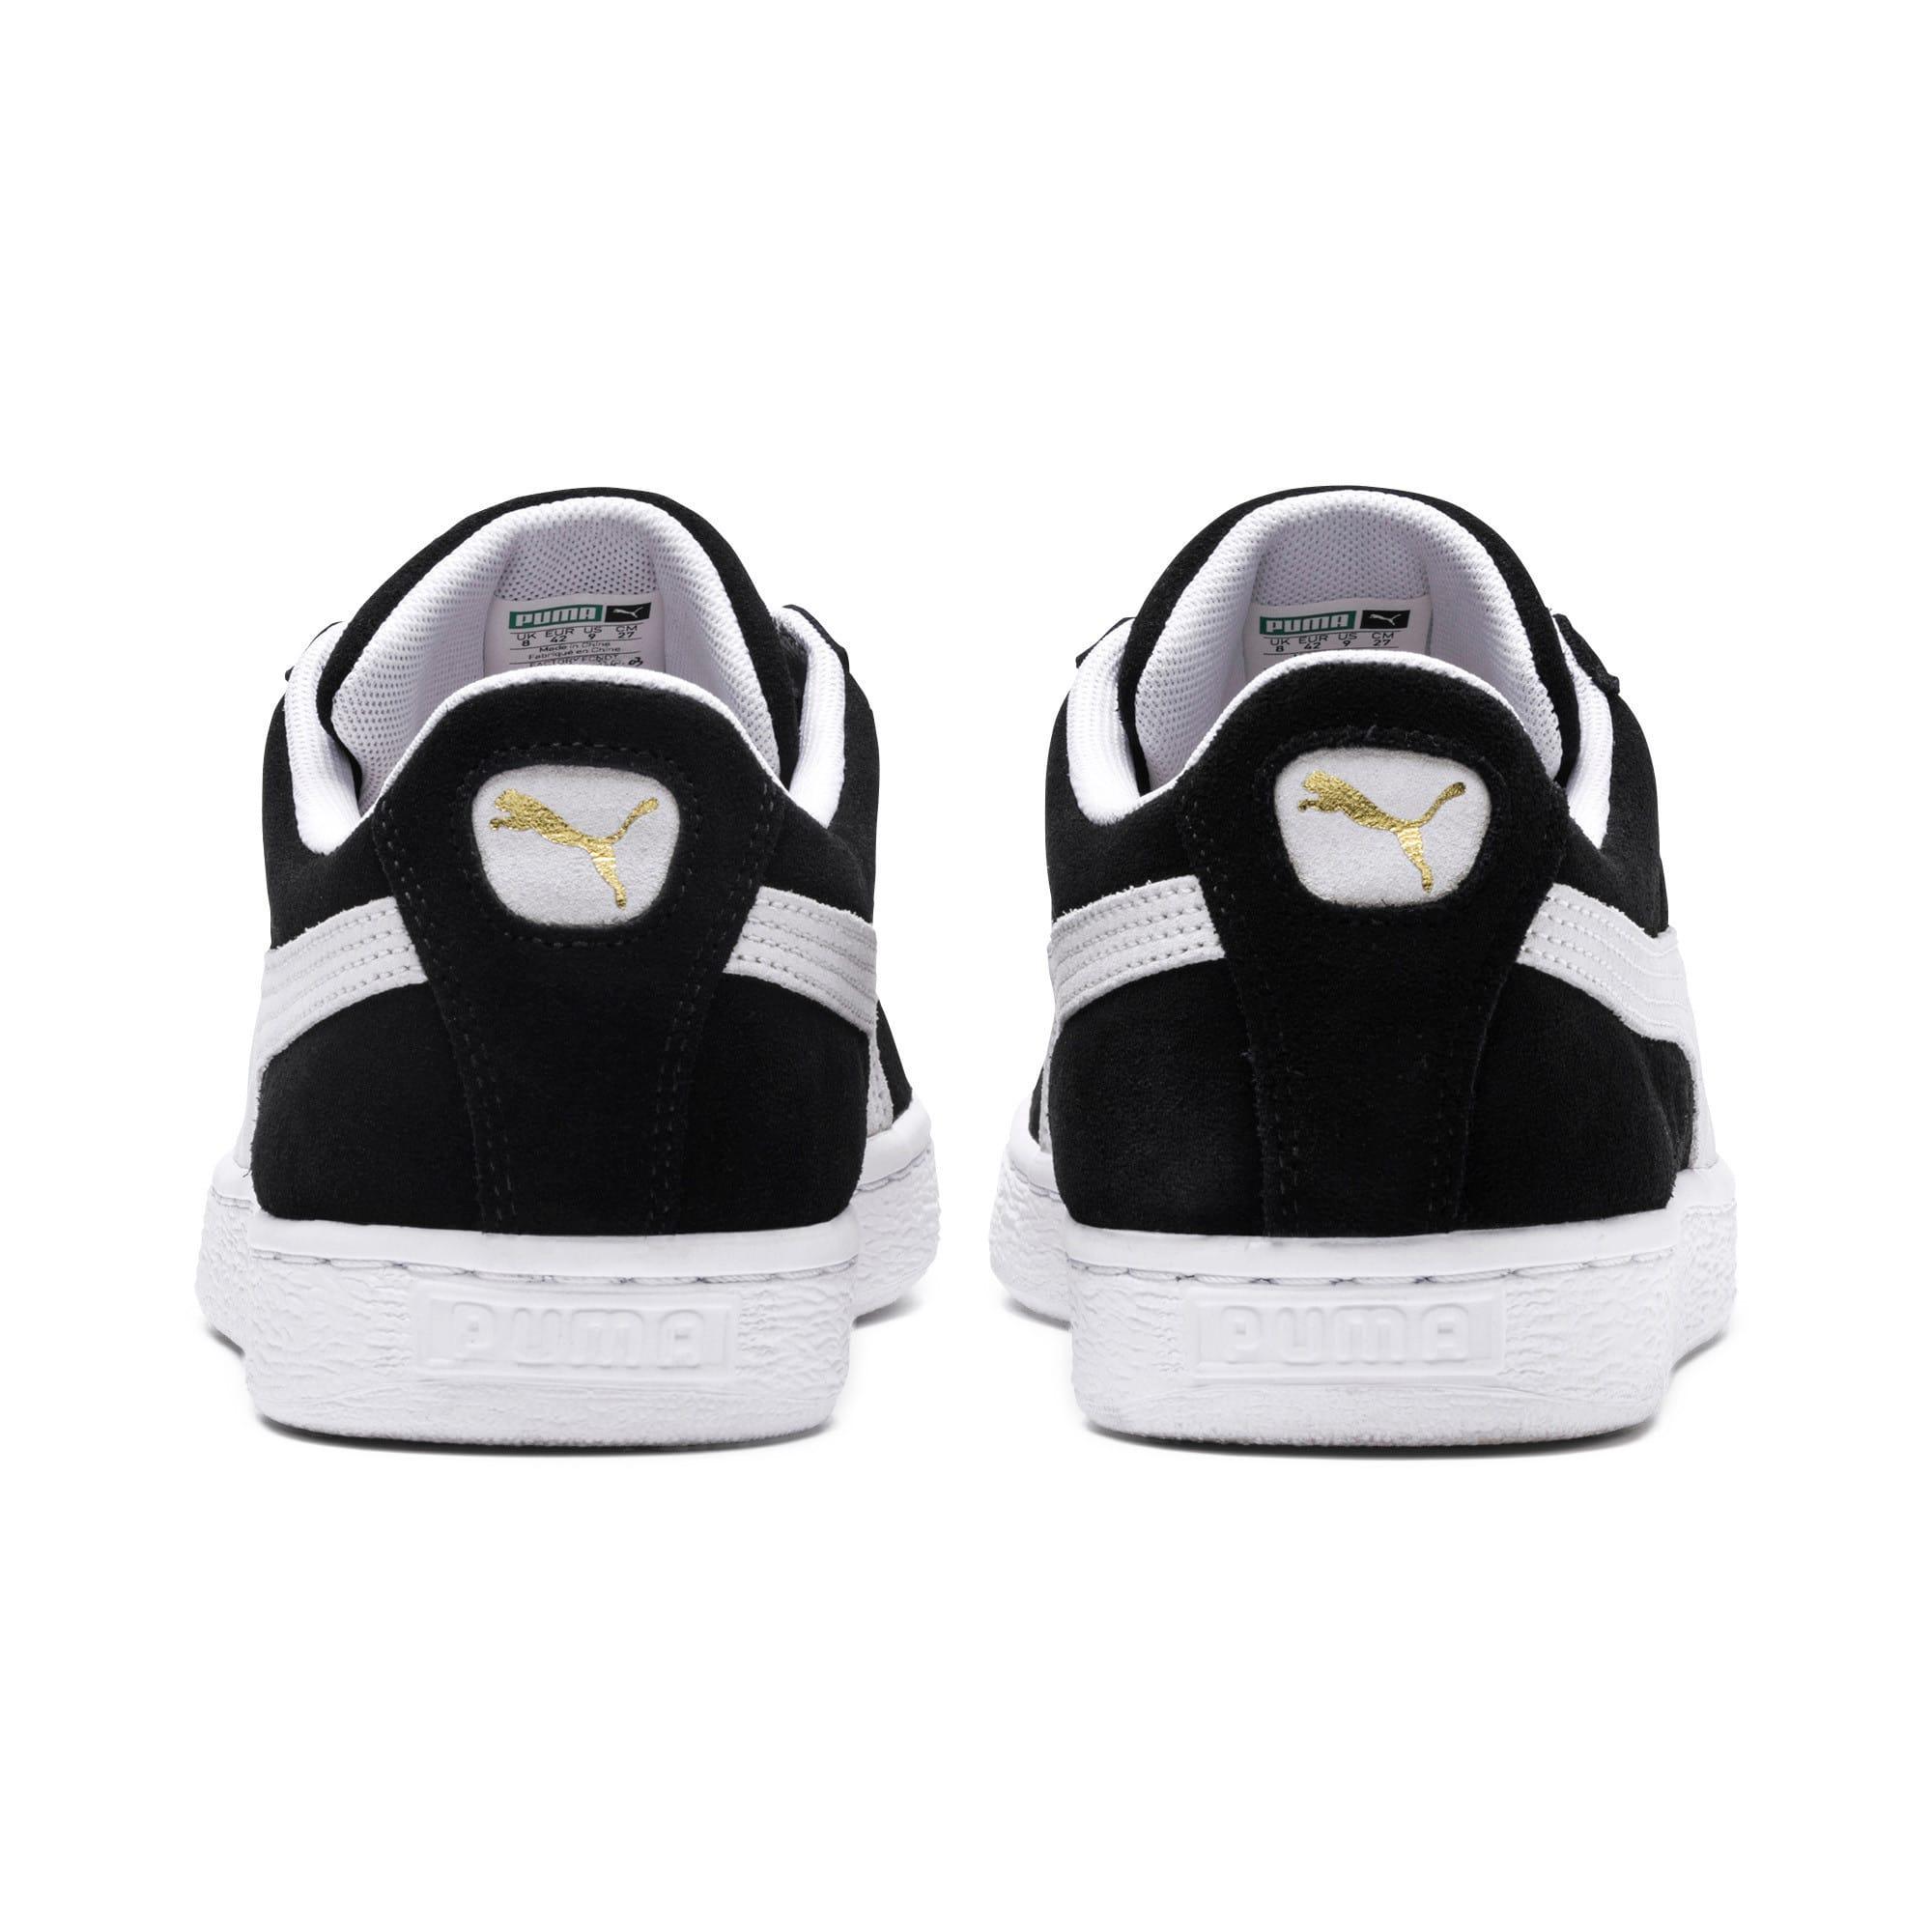 Thumbnail 3 of Suede Classic Women's Sneakers, black, medium